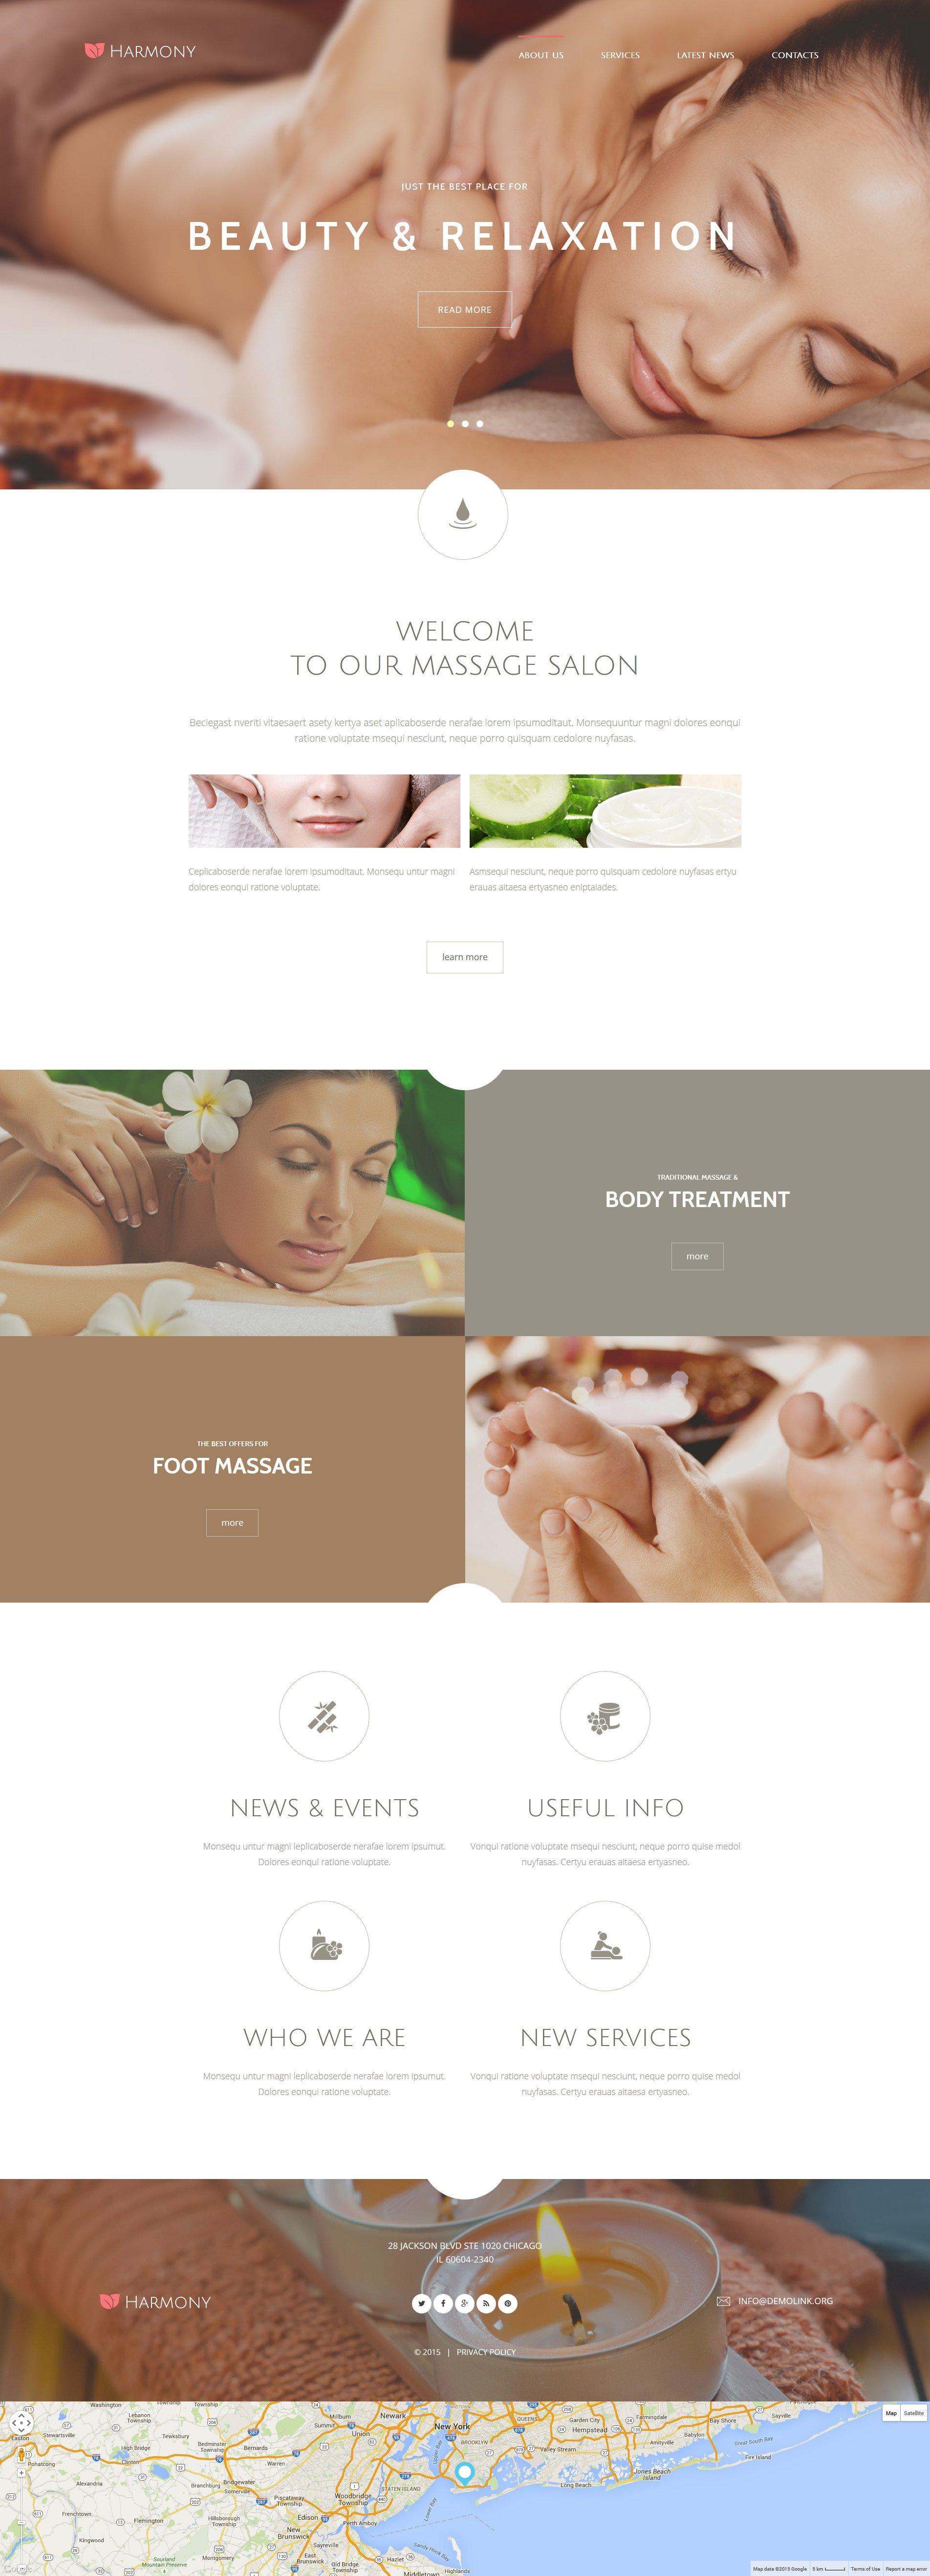 Harmony - Massage Salon Responsive Elegant Template Joomla №55058